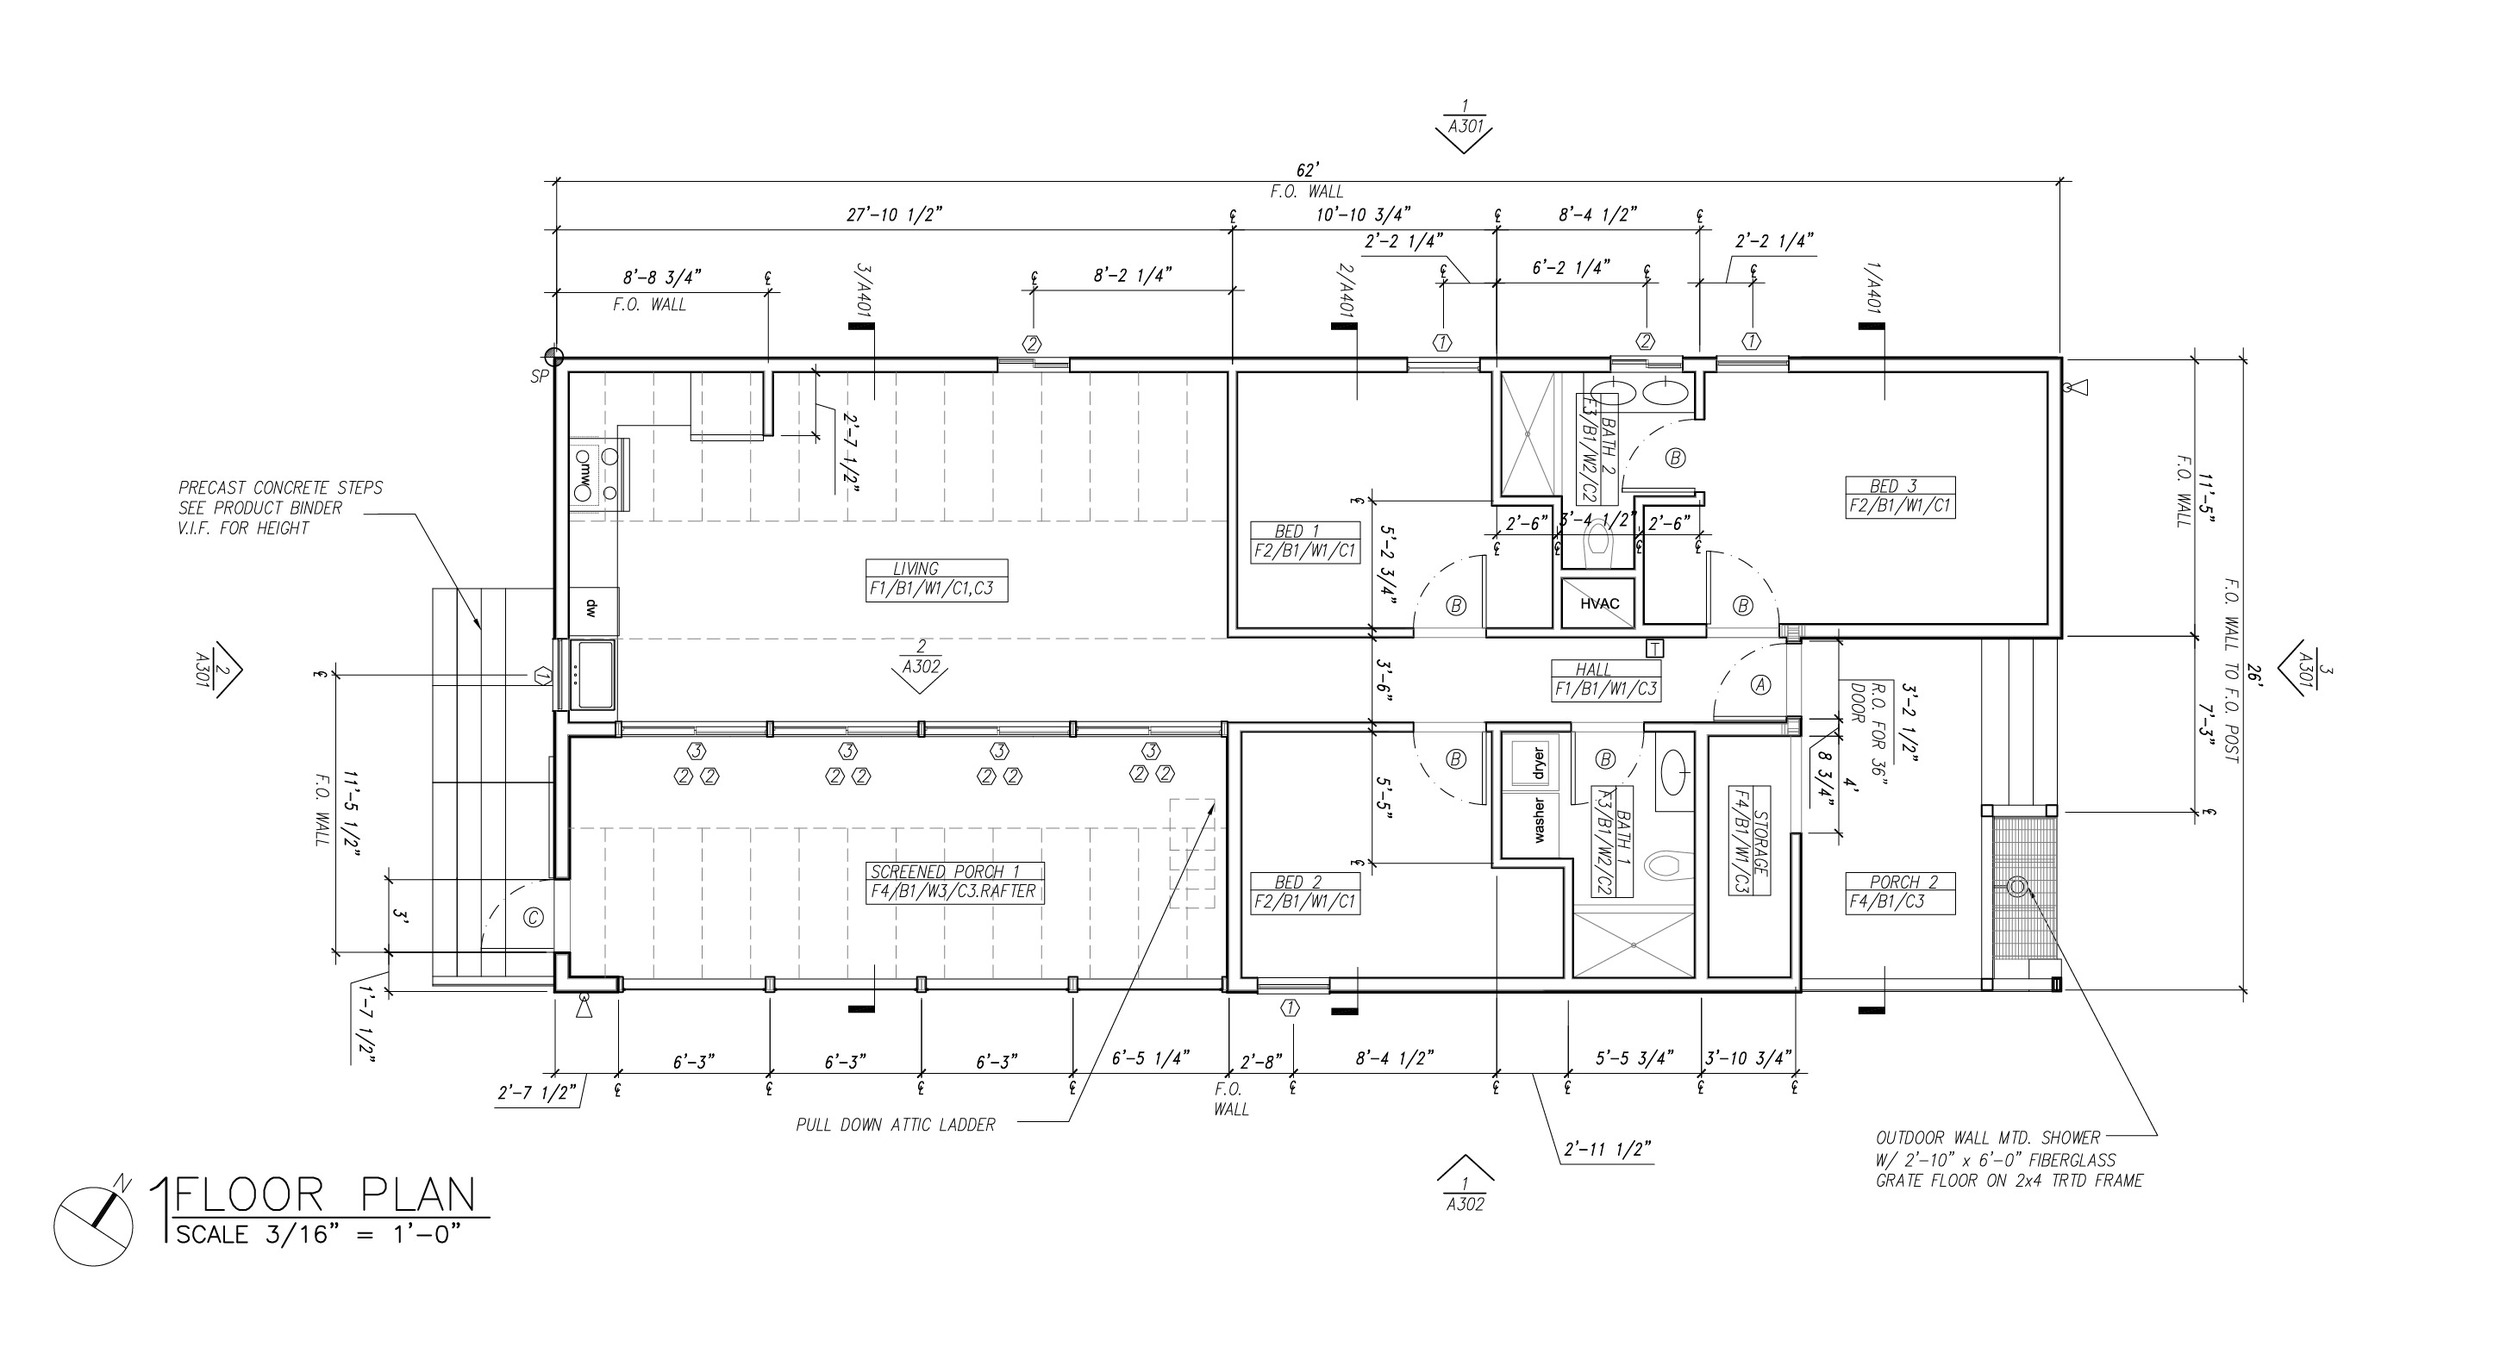 BSL2 Floorplan-01.jpg